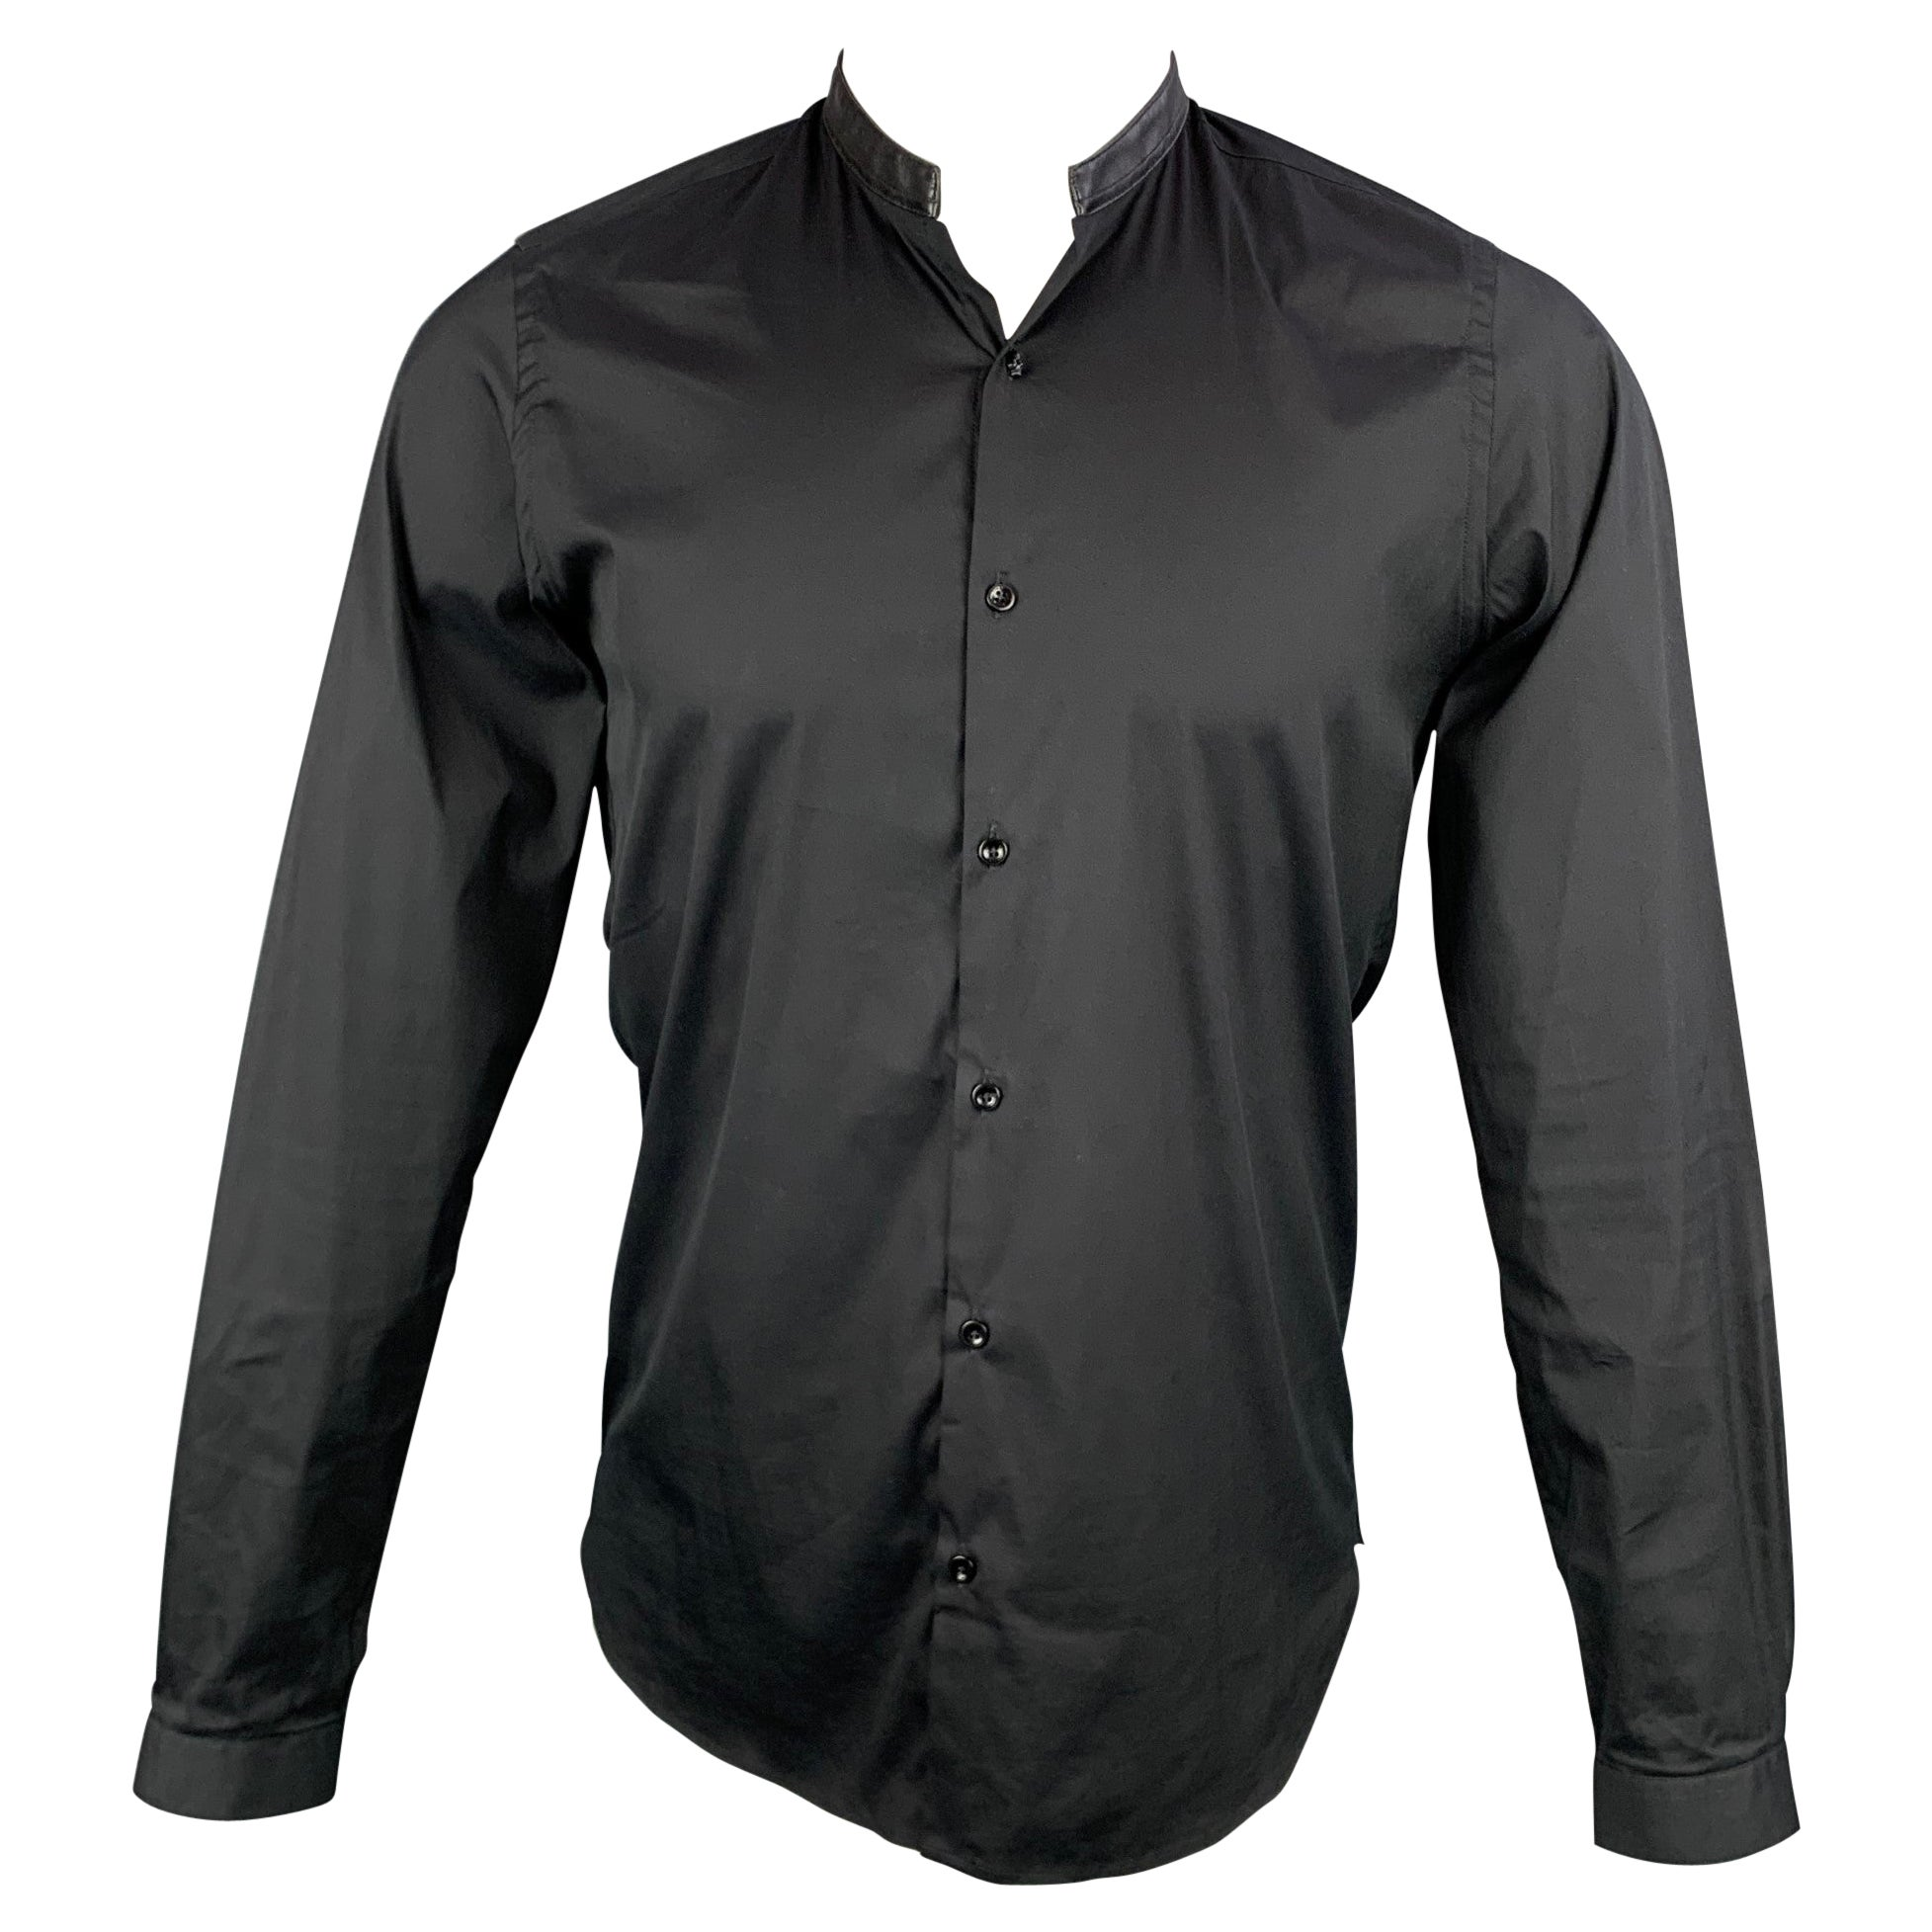 THE KOOPLES Size S Black Cotton Leather Nehru Collar Long Sleeve Shirt